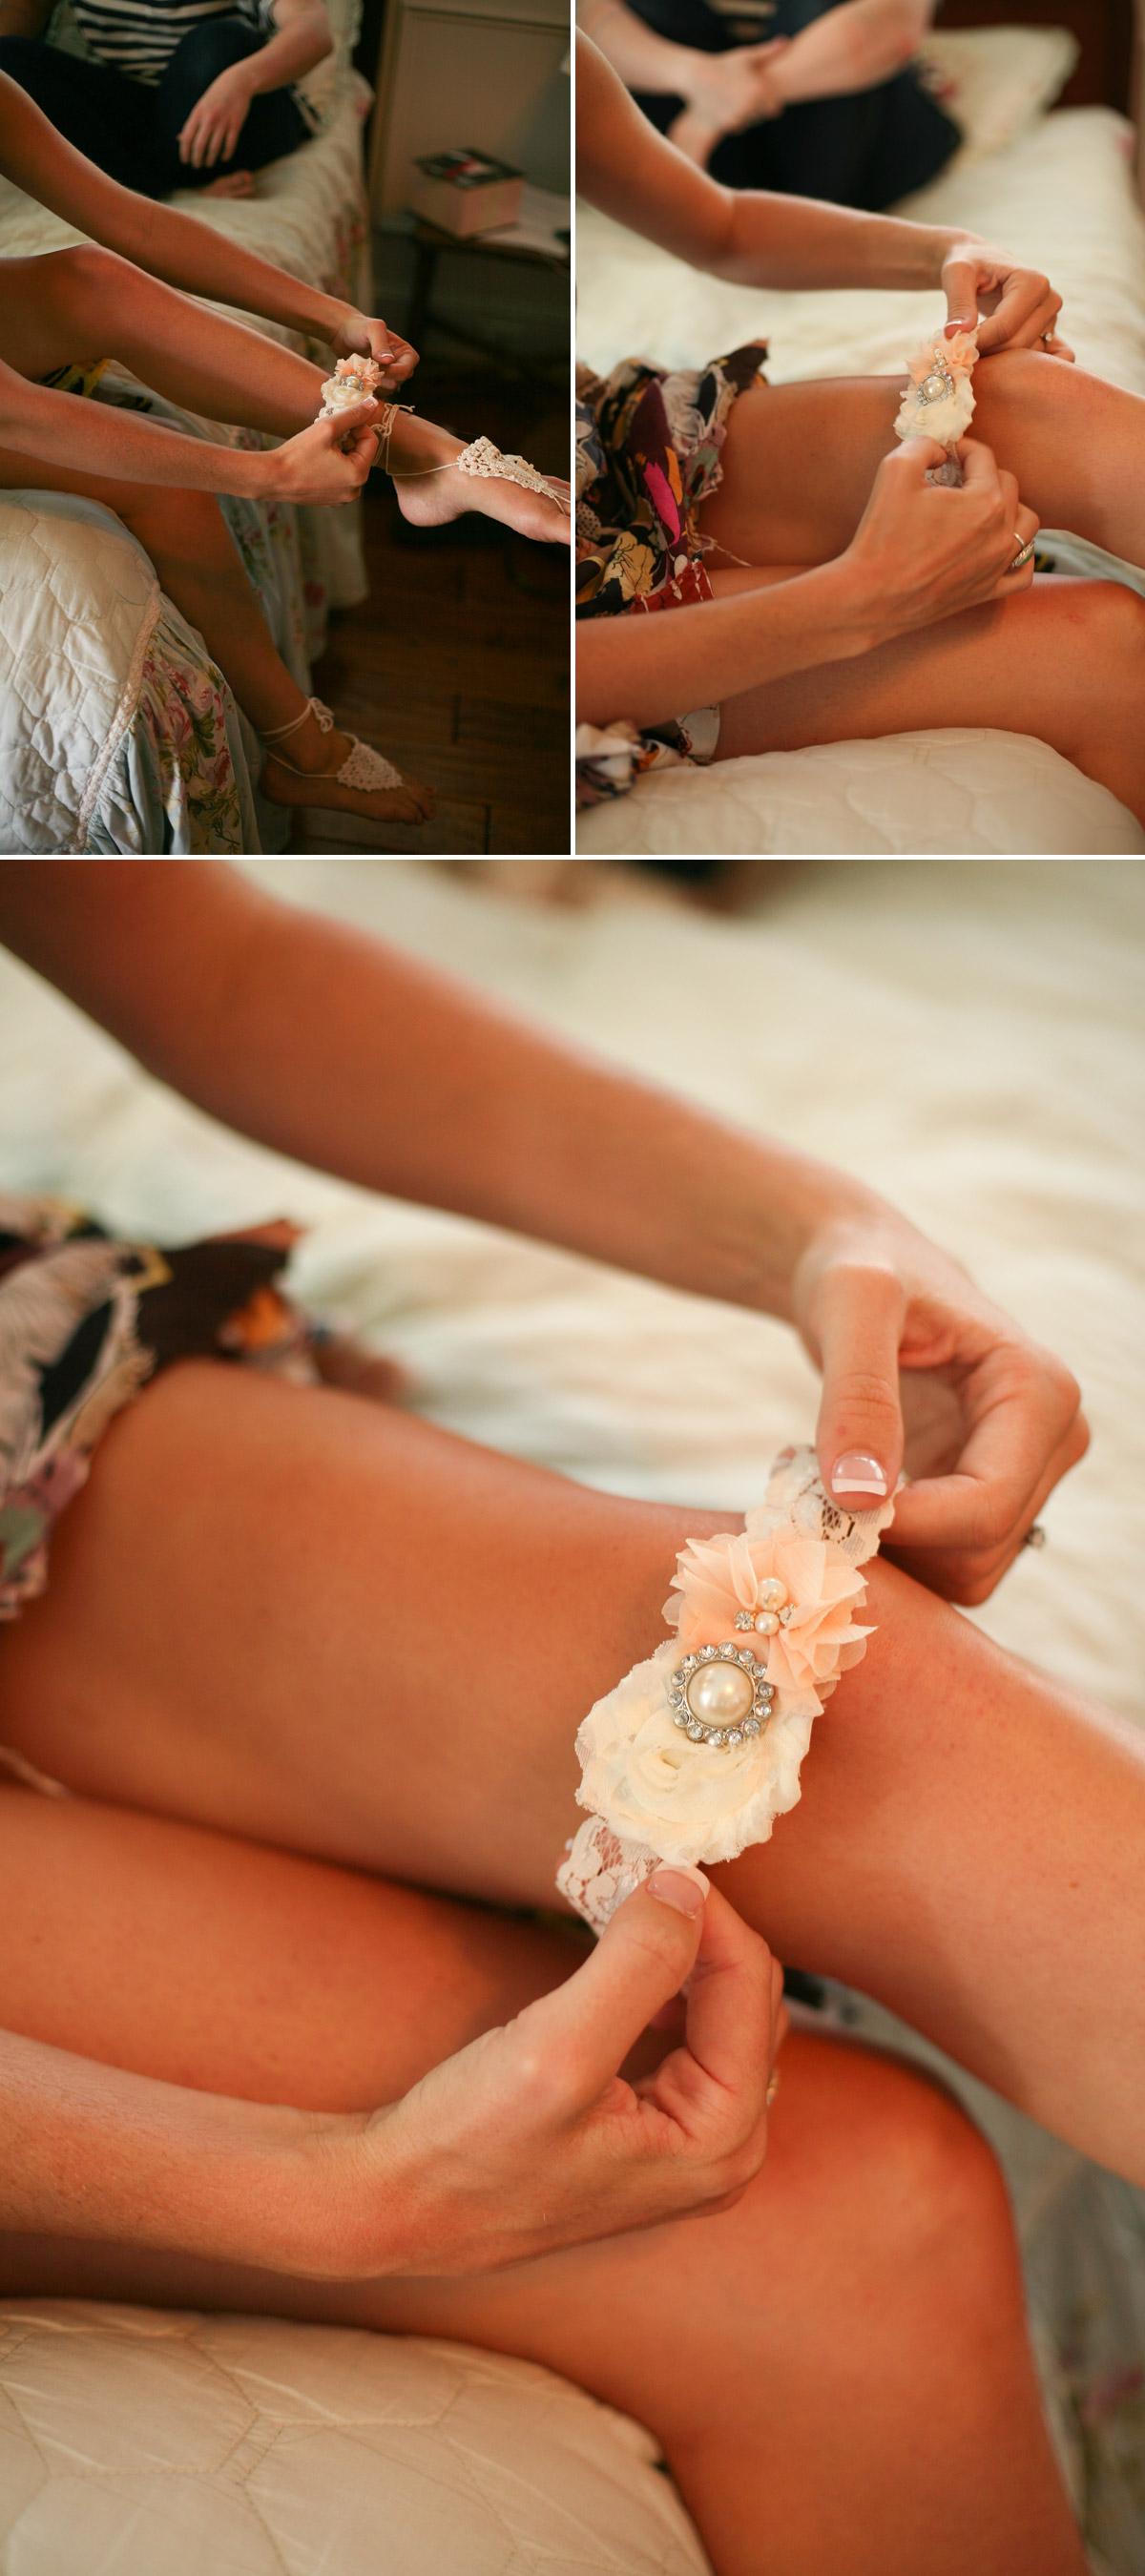 Blog-Collage-1401686597801.jpg